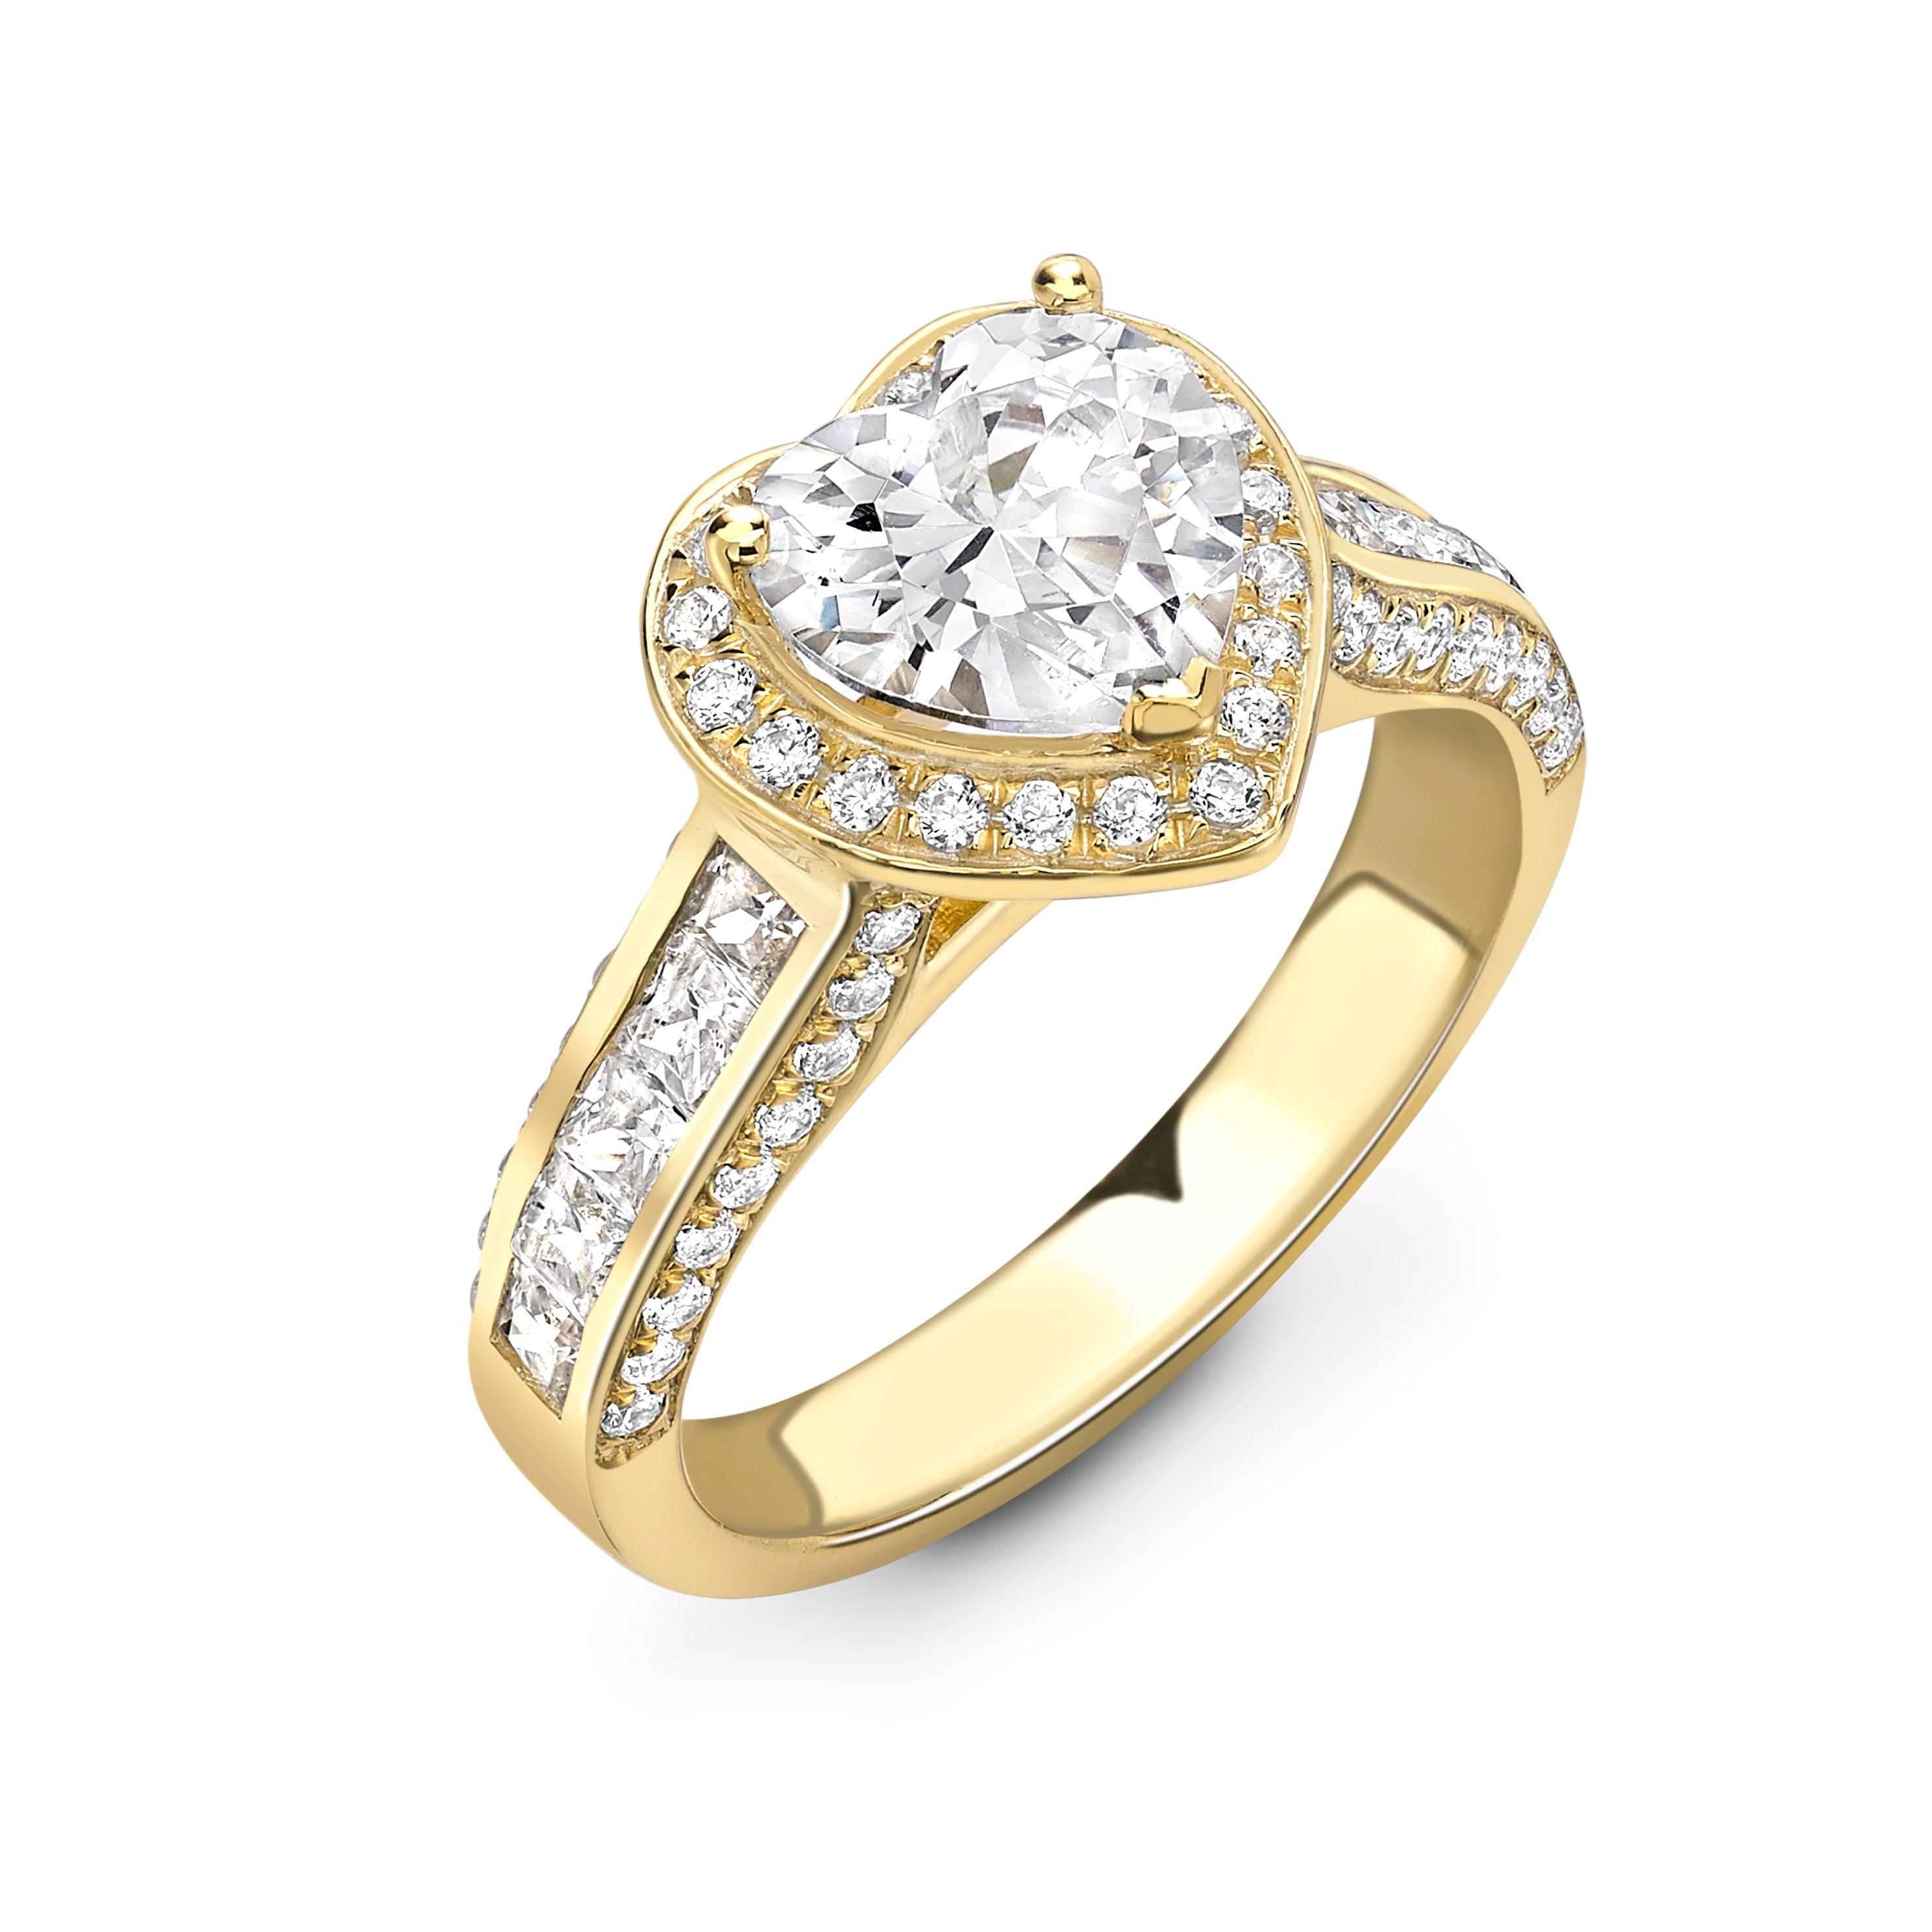 4 Prong Setting Heart Shape Vintage Style Halo Diamond Engagement Rings